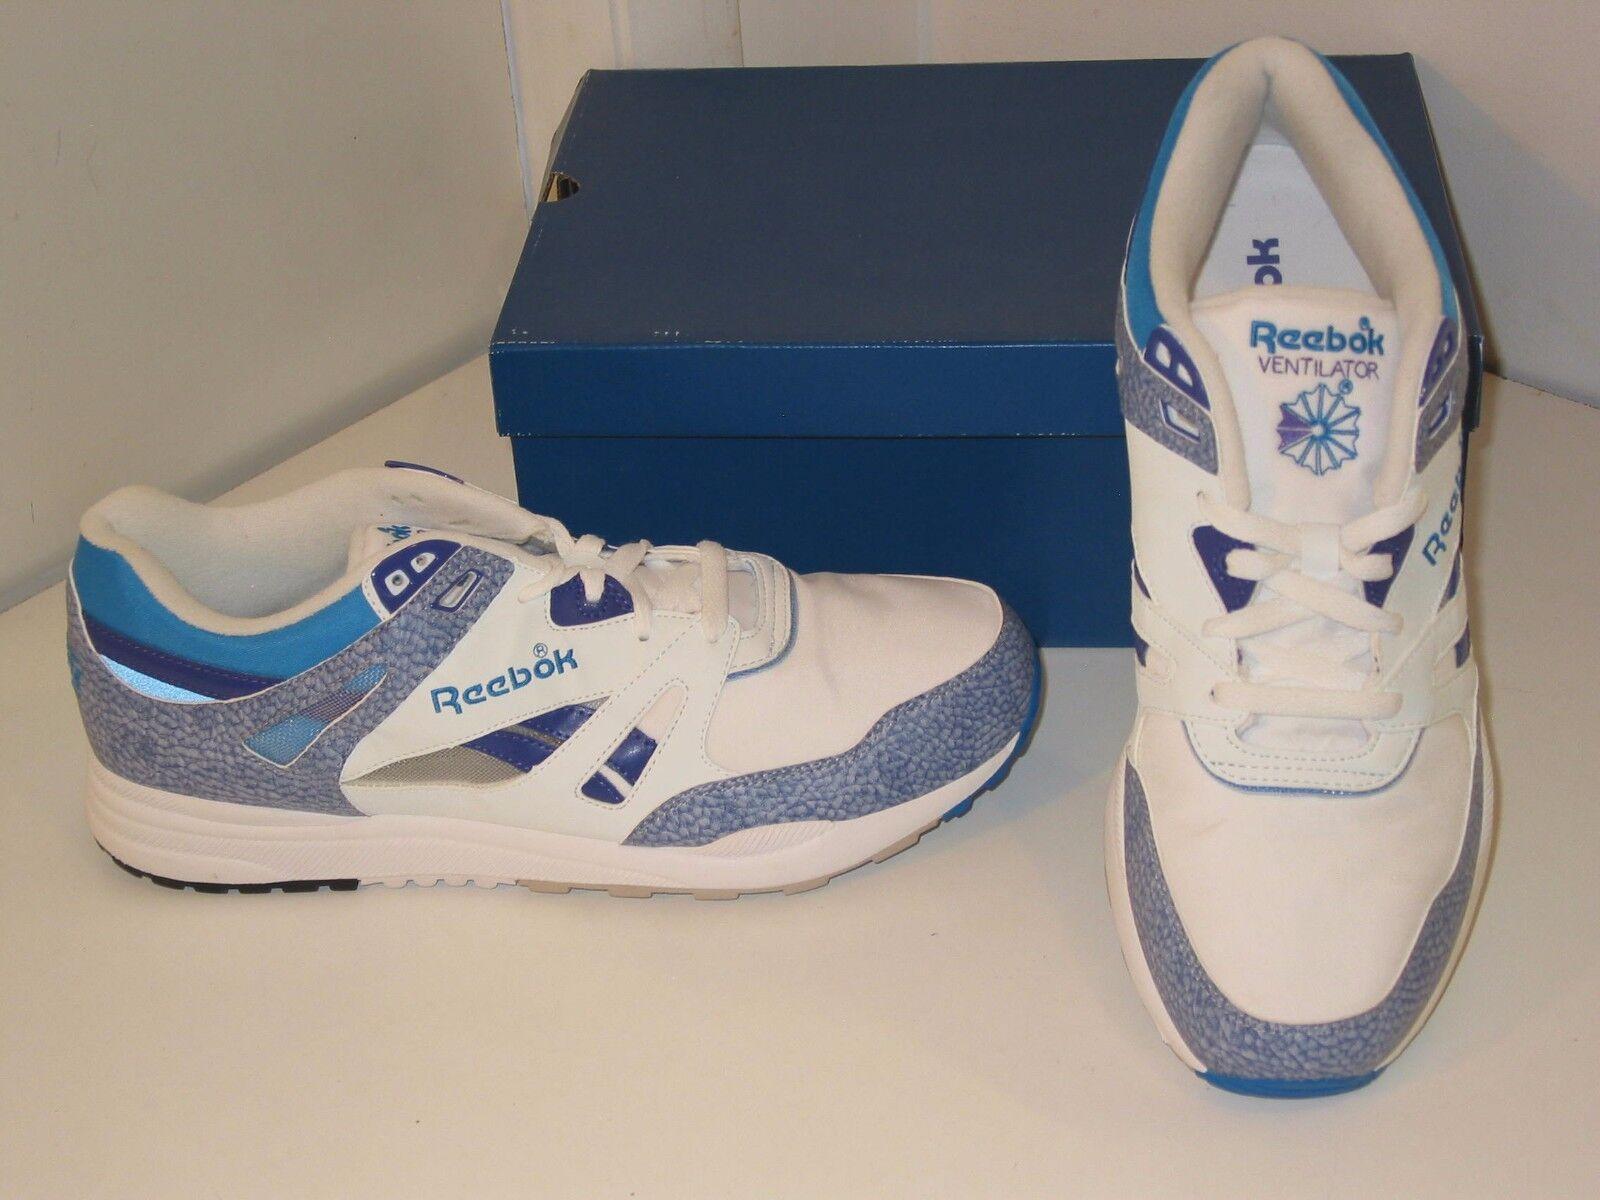 Reebok Ventilator Running Training White, bluee & Purple Sneakers shoes Mens 12